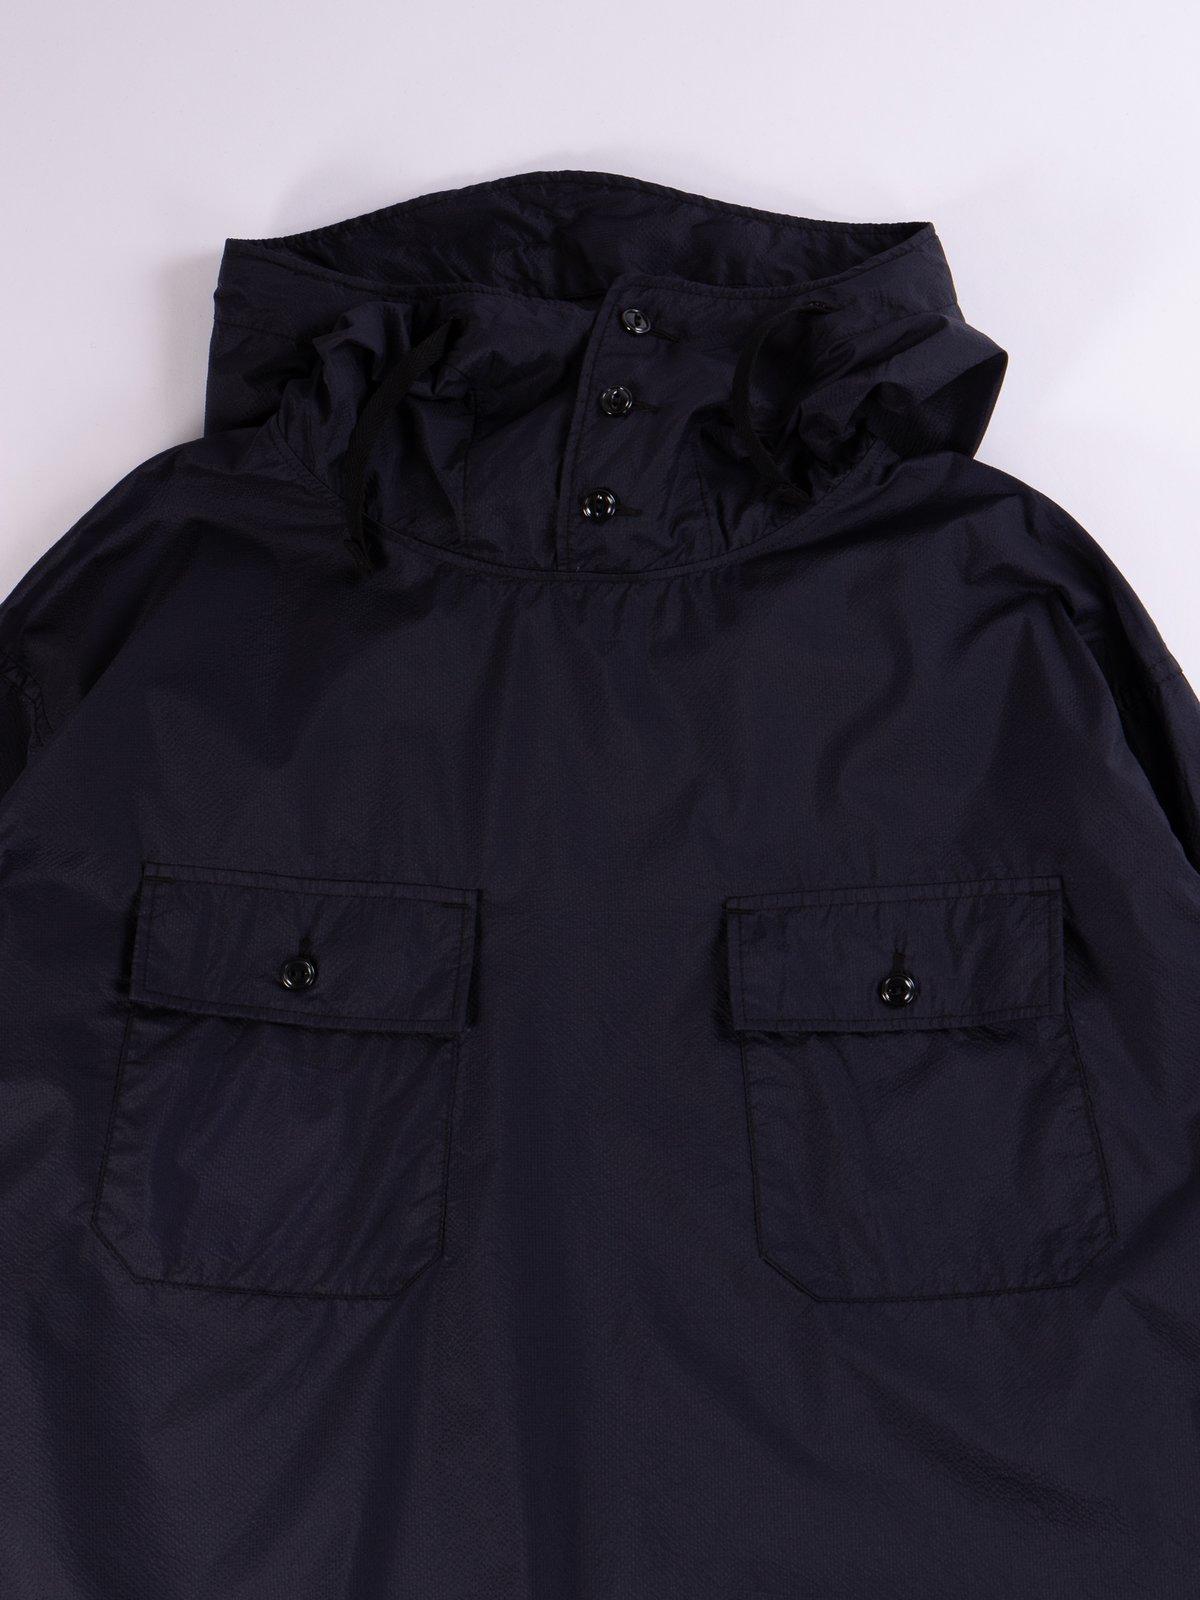 Dark Navy Nylon Micro Ripstop Cagoule Shirt - Image 4